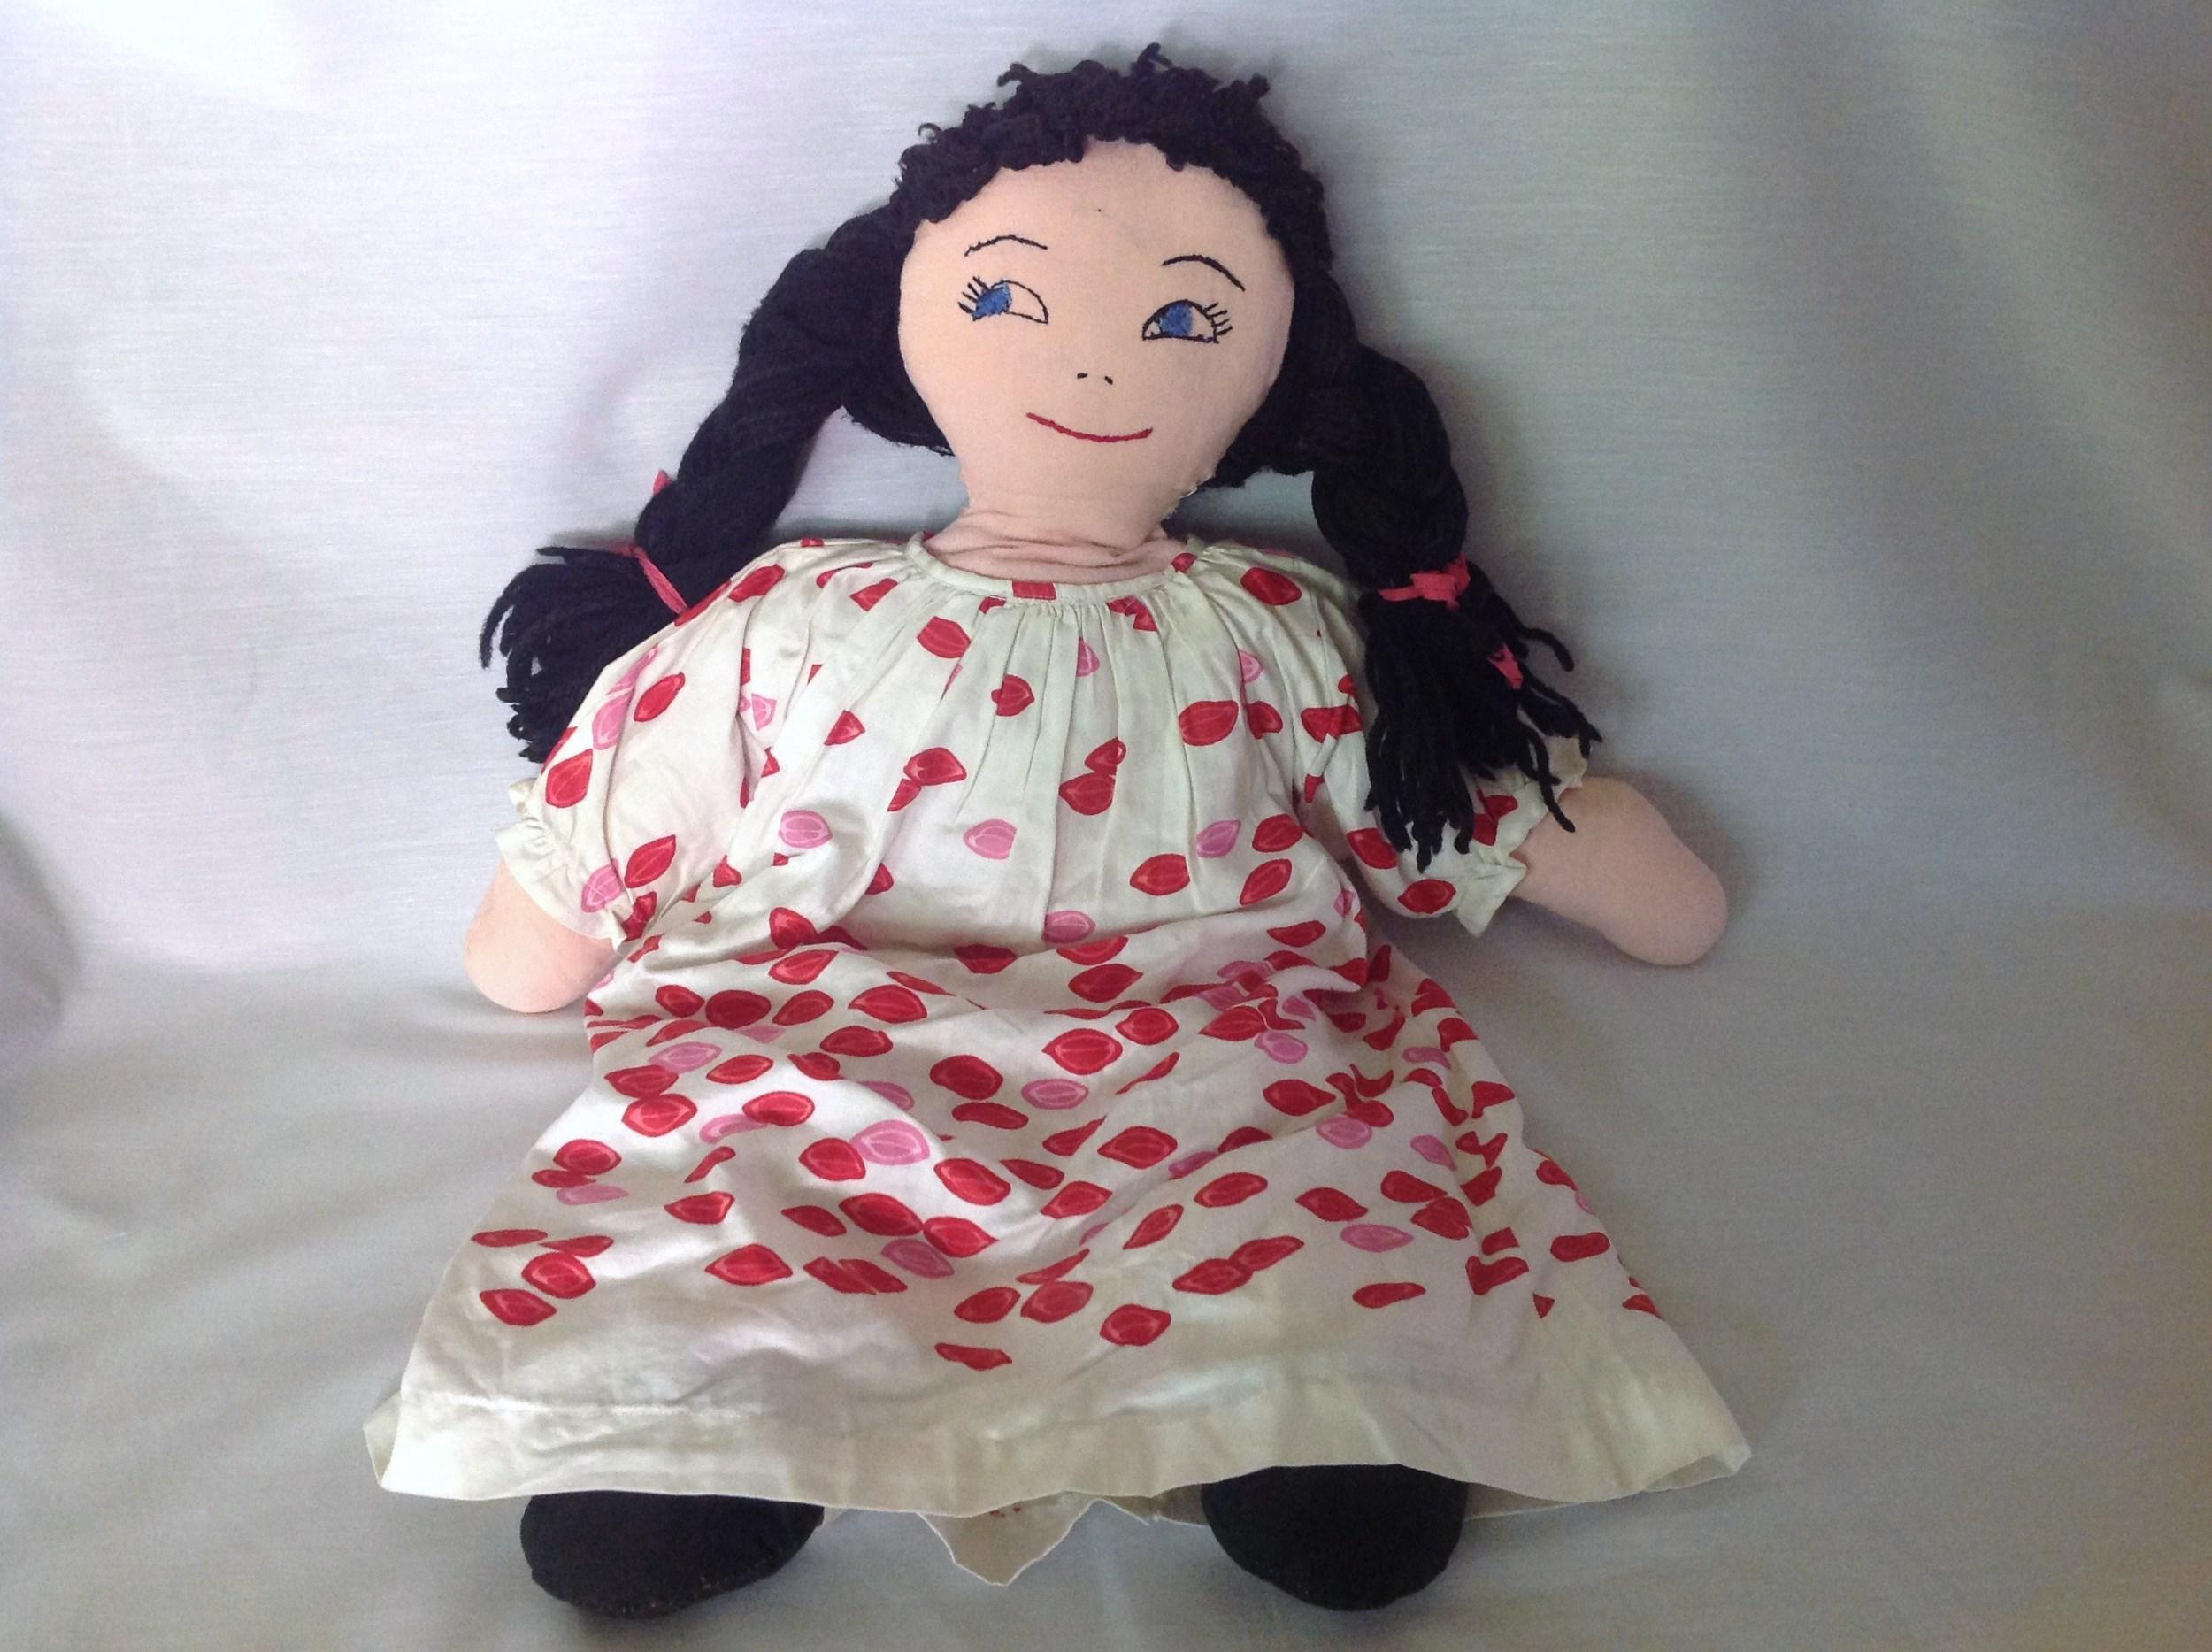 The rag doll Grandma Ethel made for me